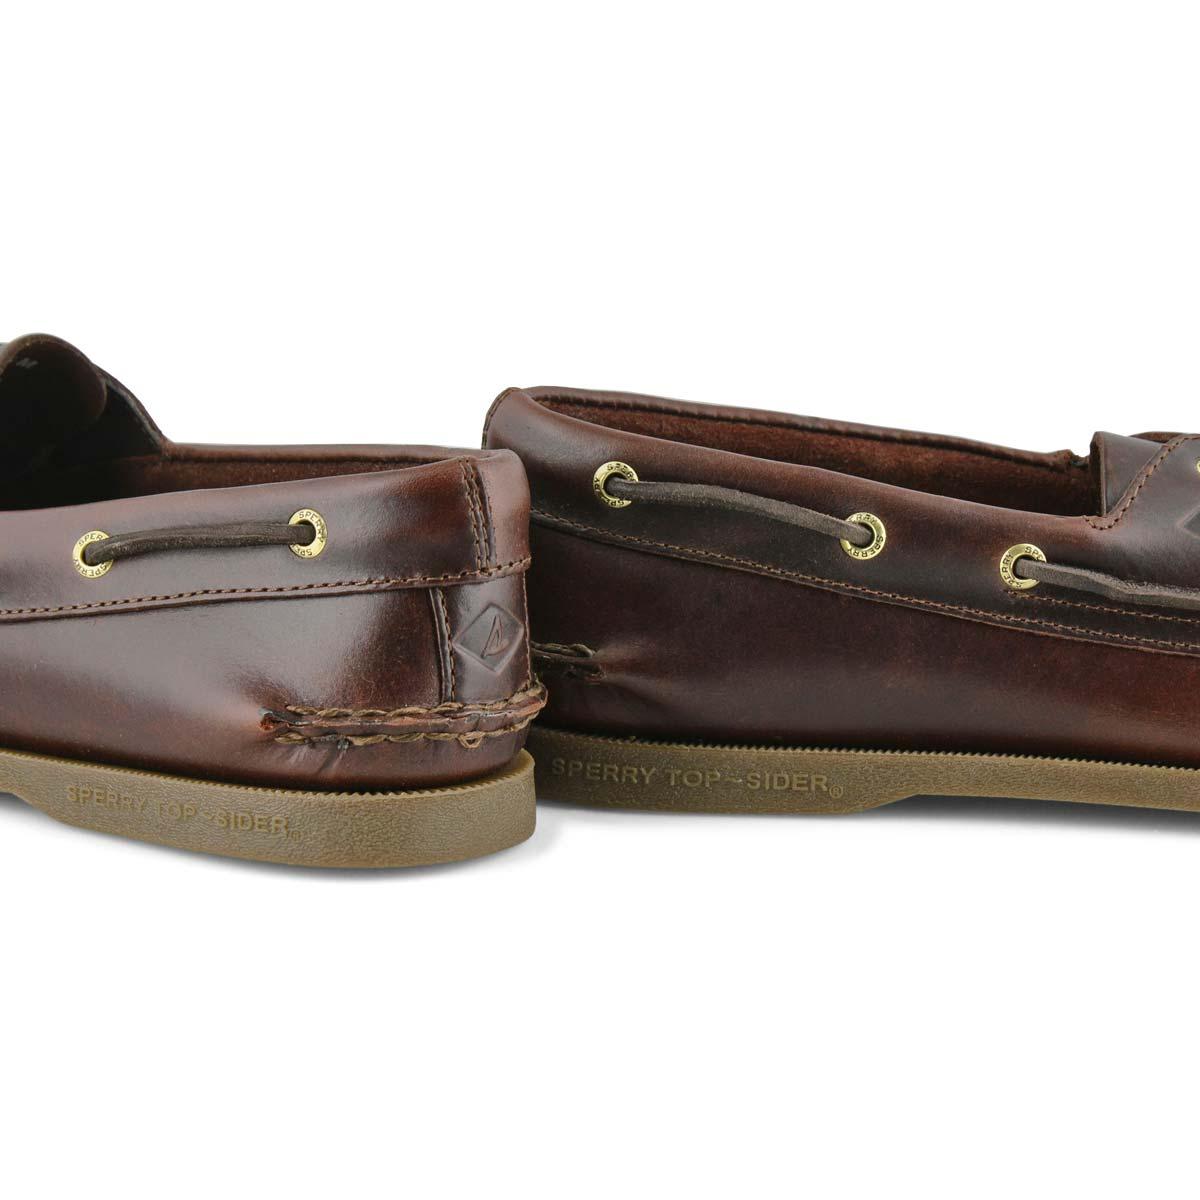 Mns A/O 2-eye amaretto boat shoe